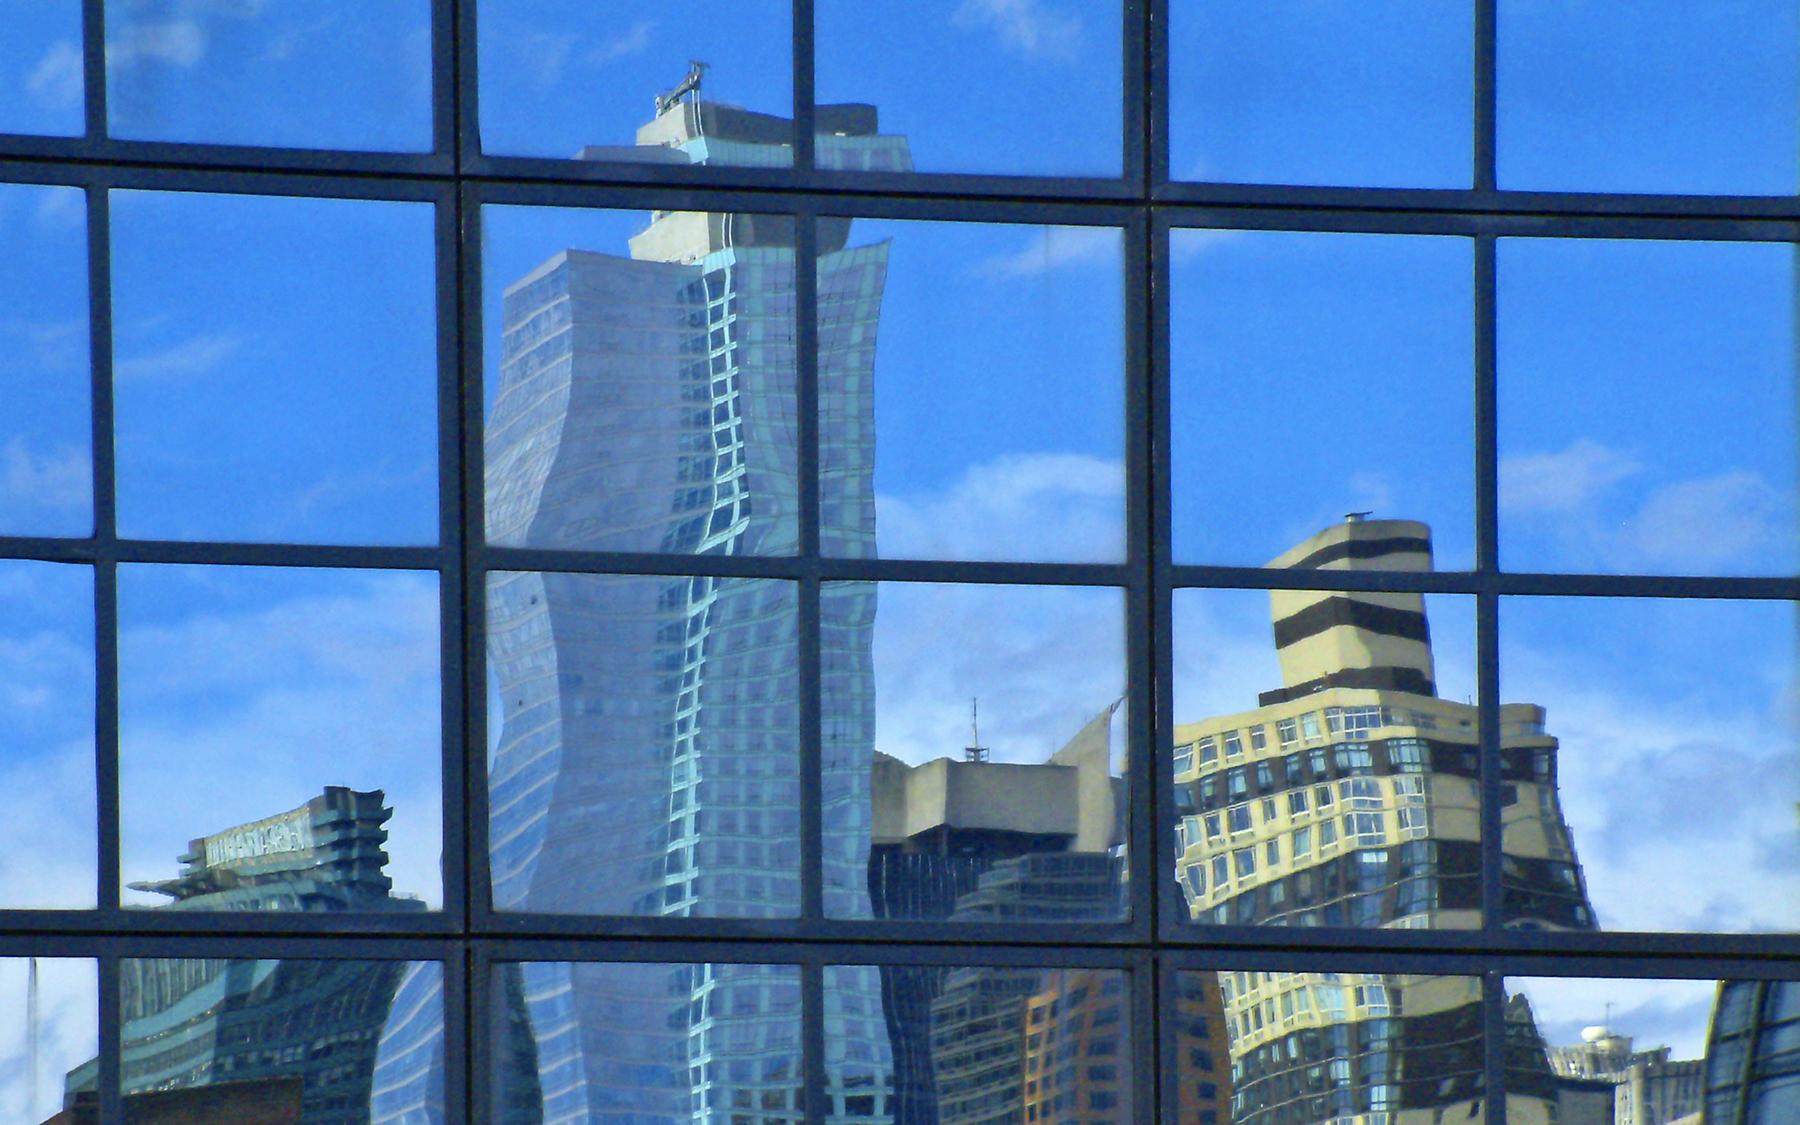 willa_davis_city-in-glass-02.jpg